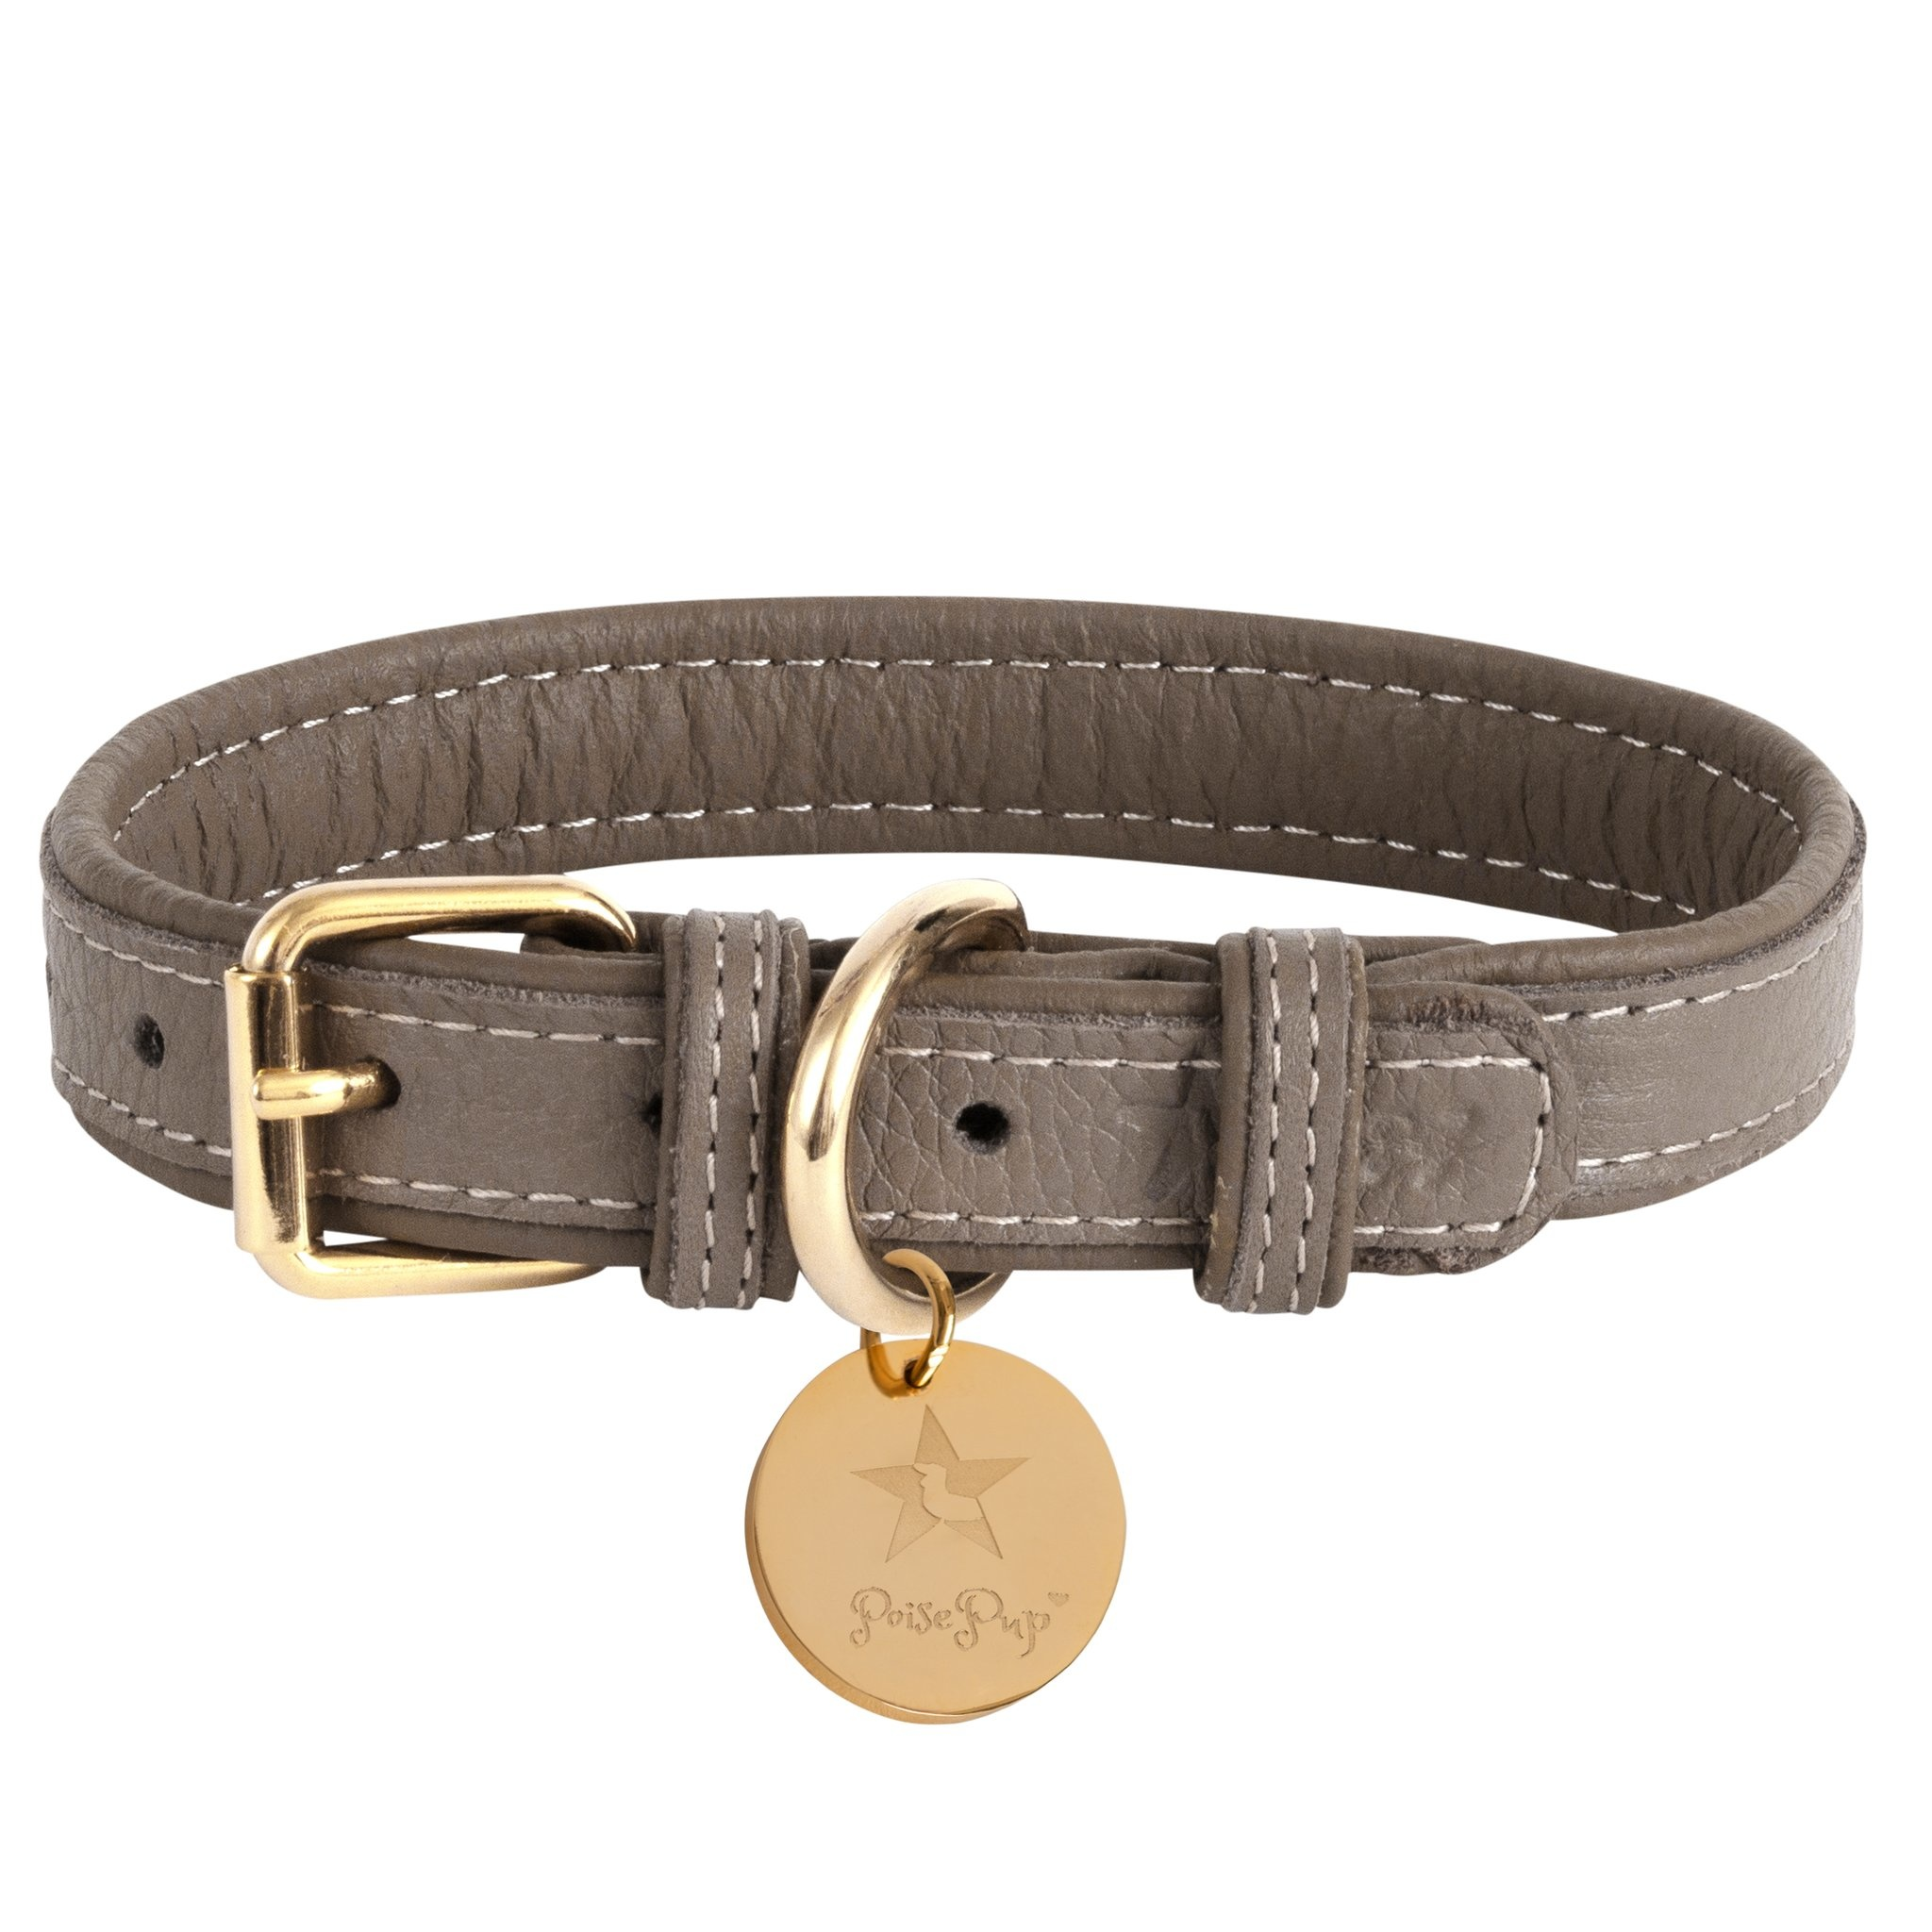 Poise Pup Collar Desert Mint Leather